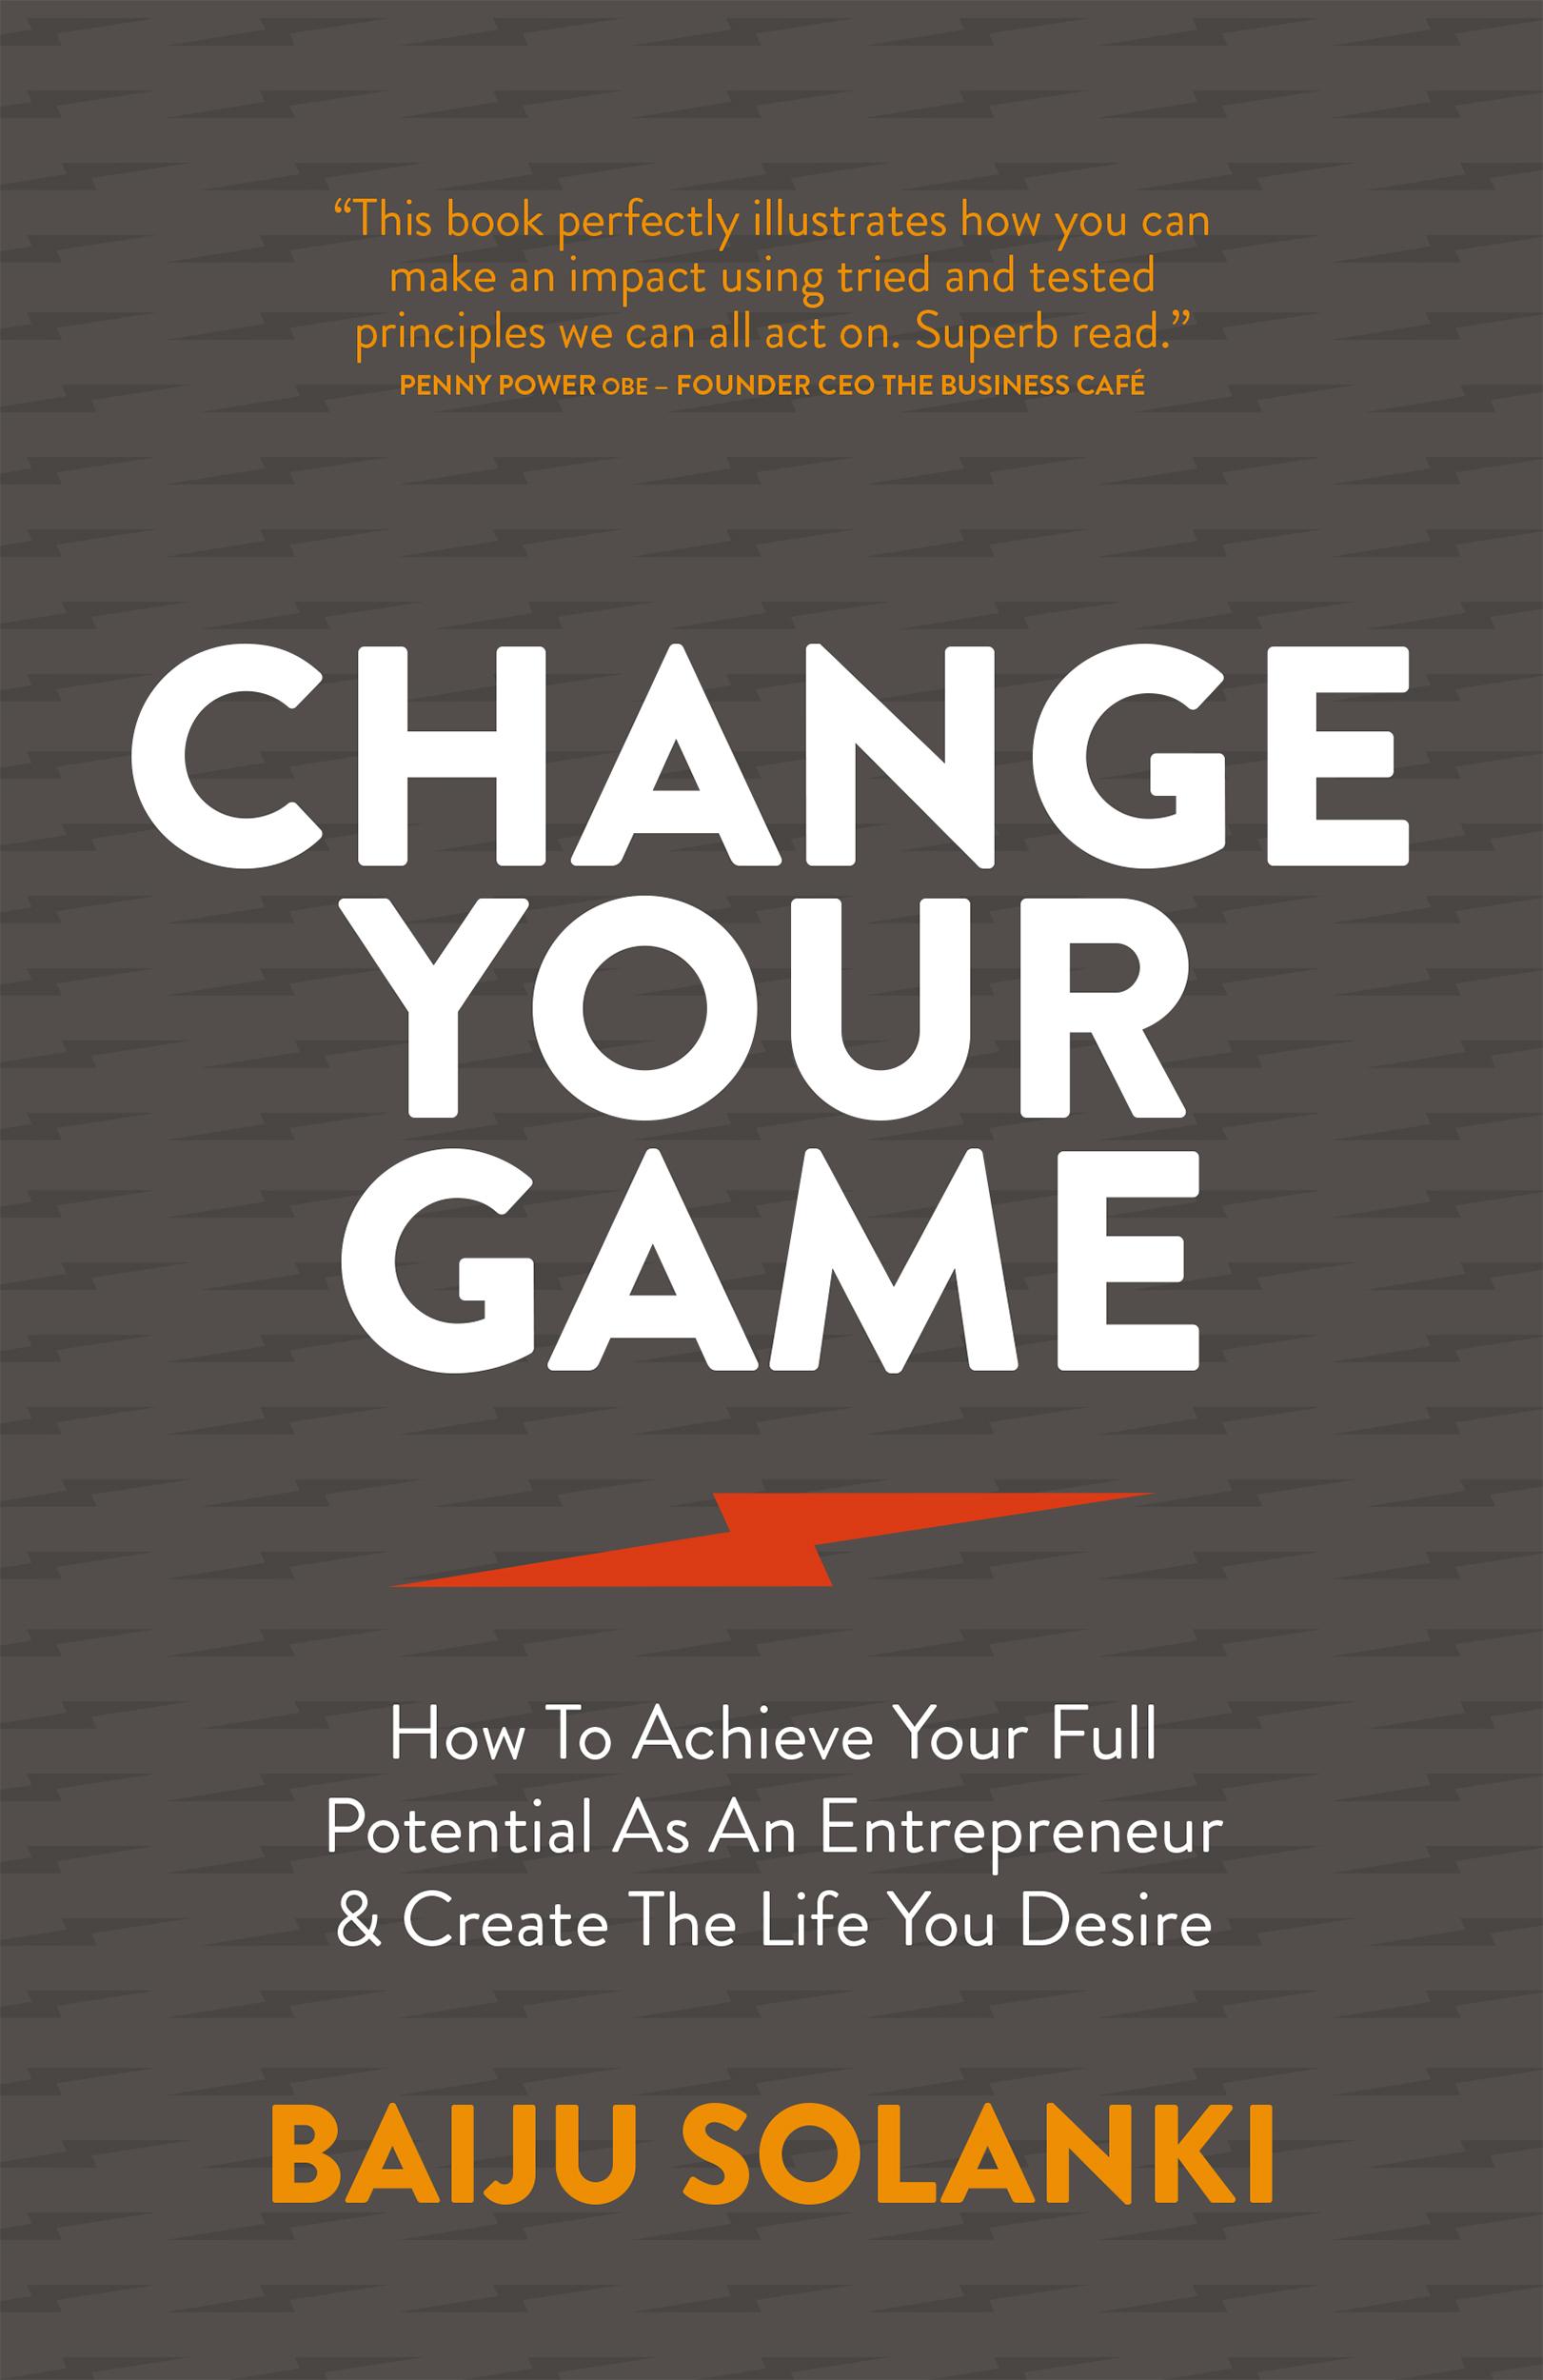 """Change Your Game"" by Baiju Solanki"